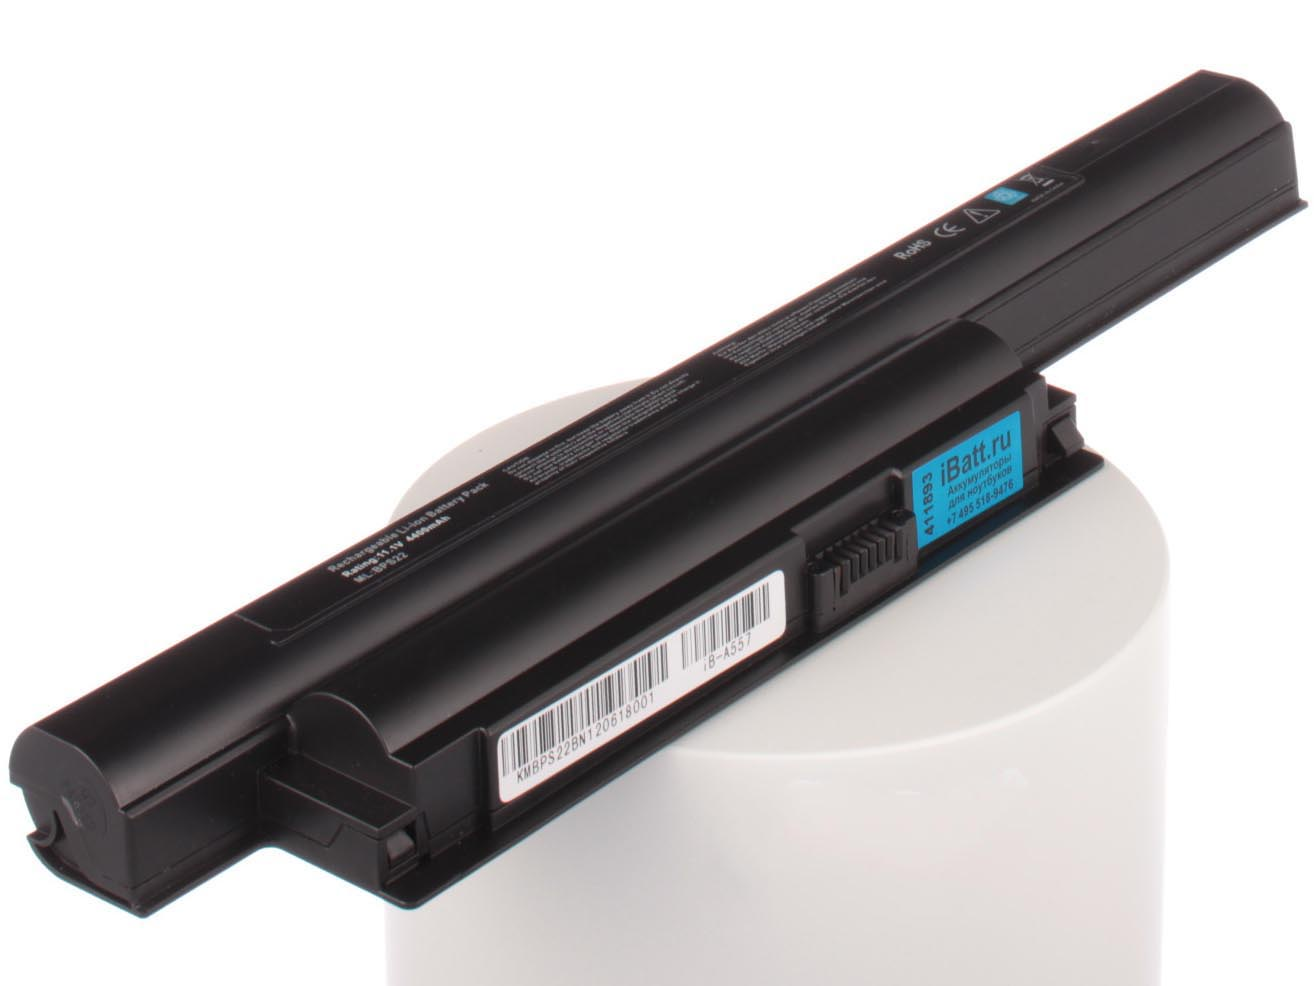 цена Аккумулятор для ноутбука iBatt для Sony VAIO PCG-79EP, VAIO VPC-EB1Z1R, VAIO VPC-EB2S1R, VAIO VPC-EB2Z1R, VAIO VPC-EF3E1R, VAIO VPC-EA2M1R, VAIO VPC-EB11GX, VAIO VPC-EB1S0E, VAIO VPC-EB2E1R, VAIO VPC-EB2E9R, VAIO VPC-EB3A4R